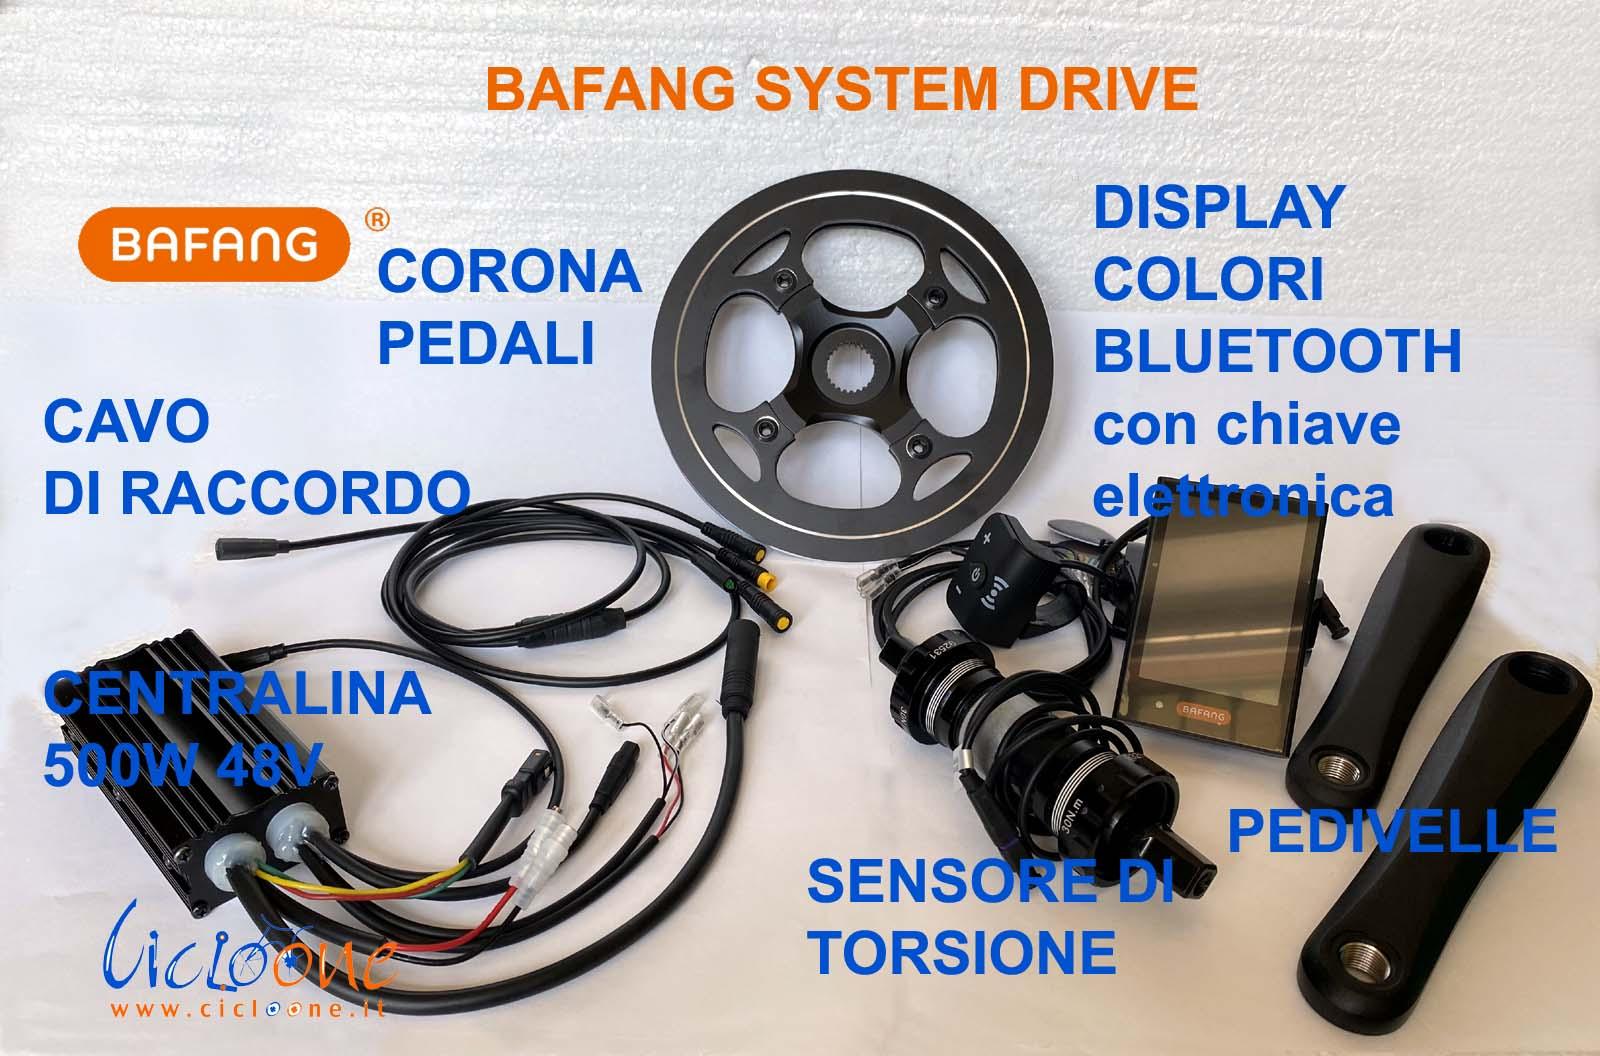 bafang system drive sensore torsione